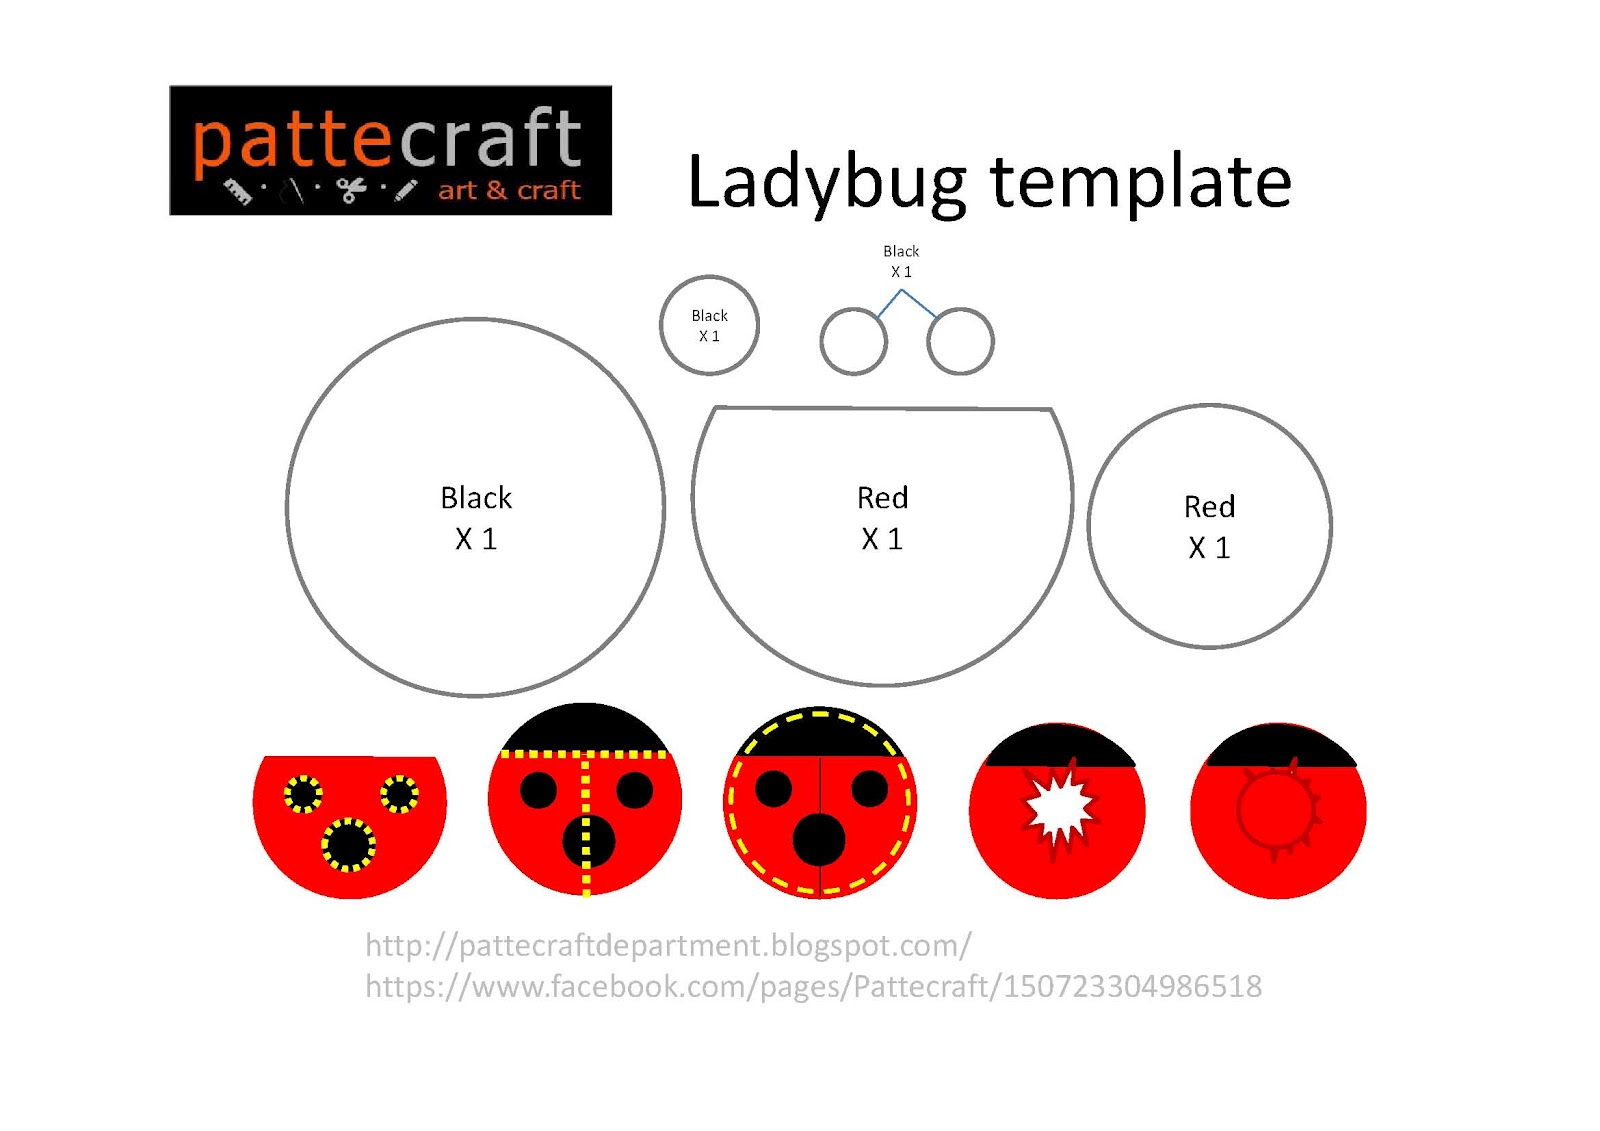 Pattecraft Give Away Ladybug Template